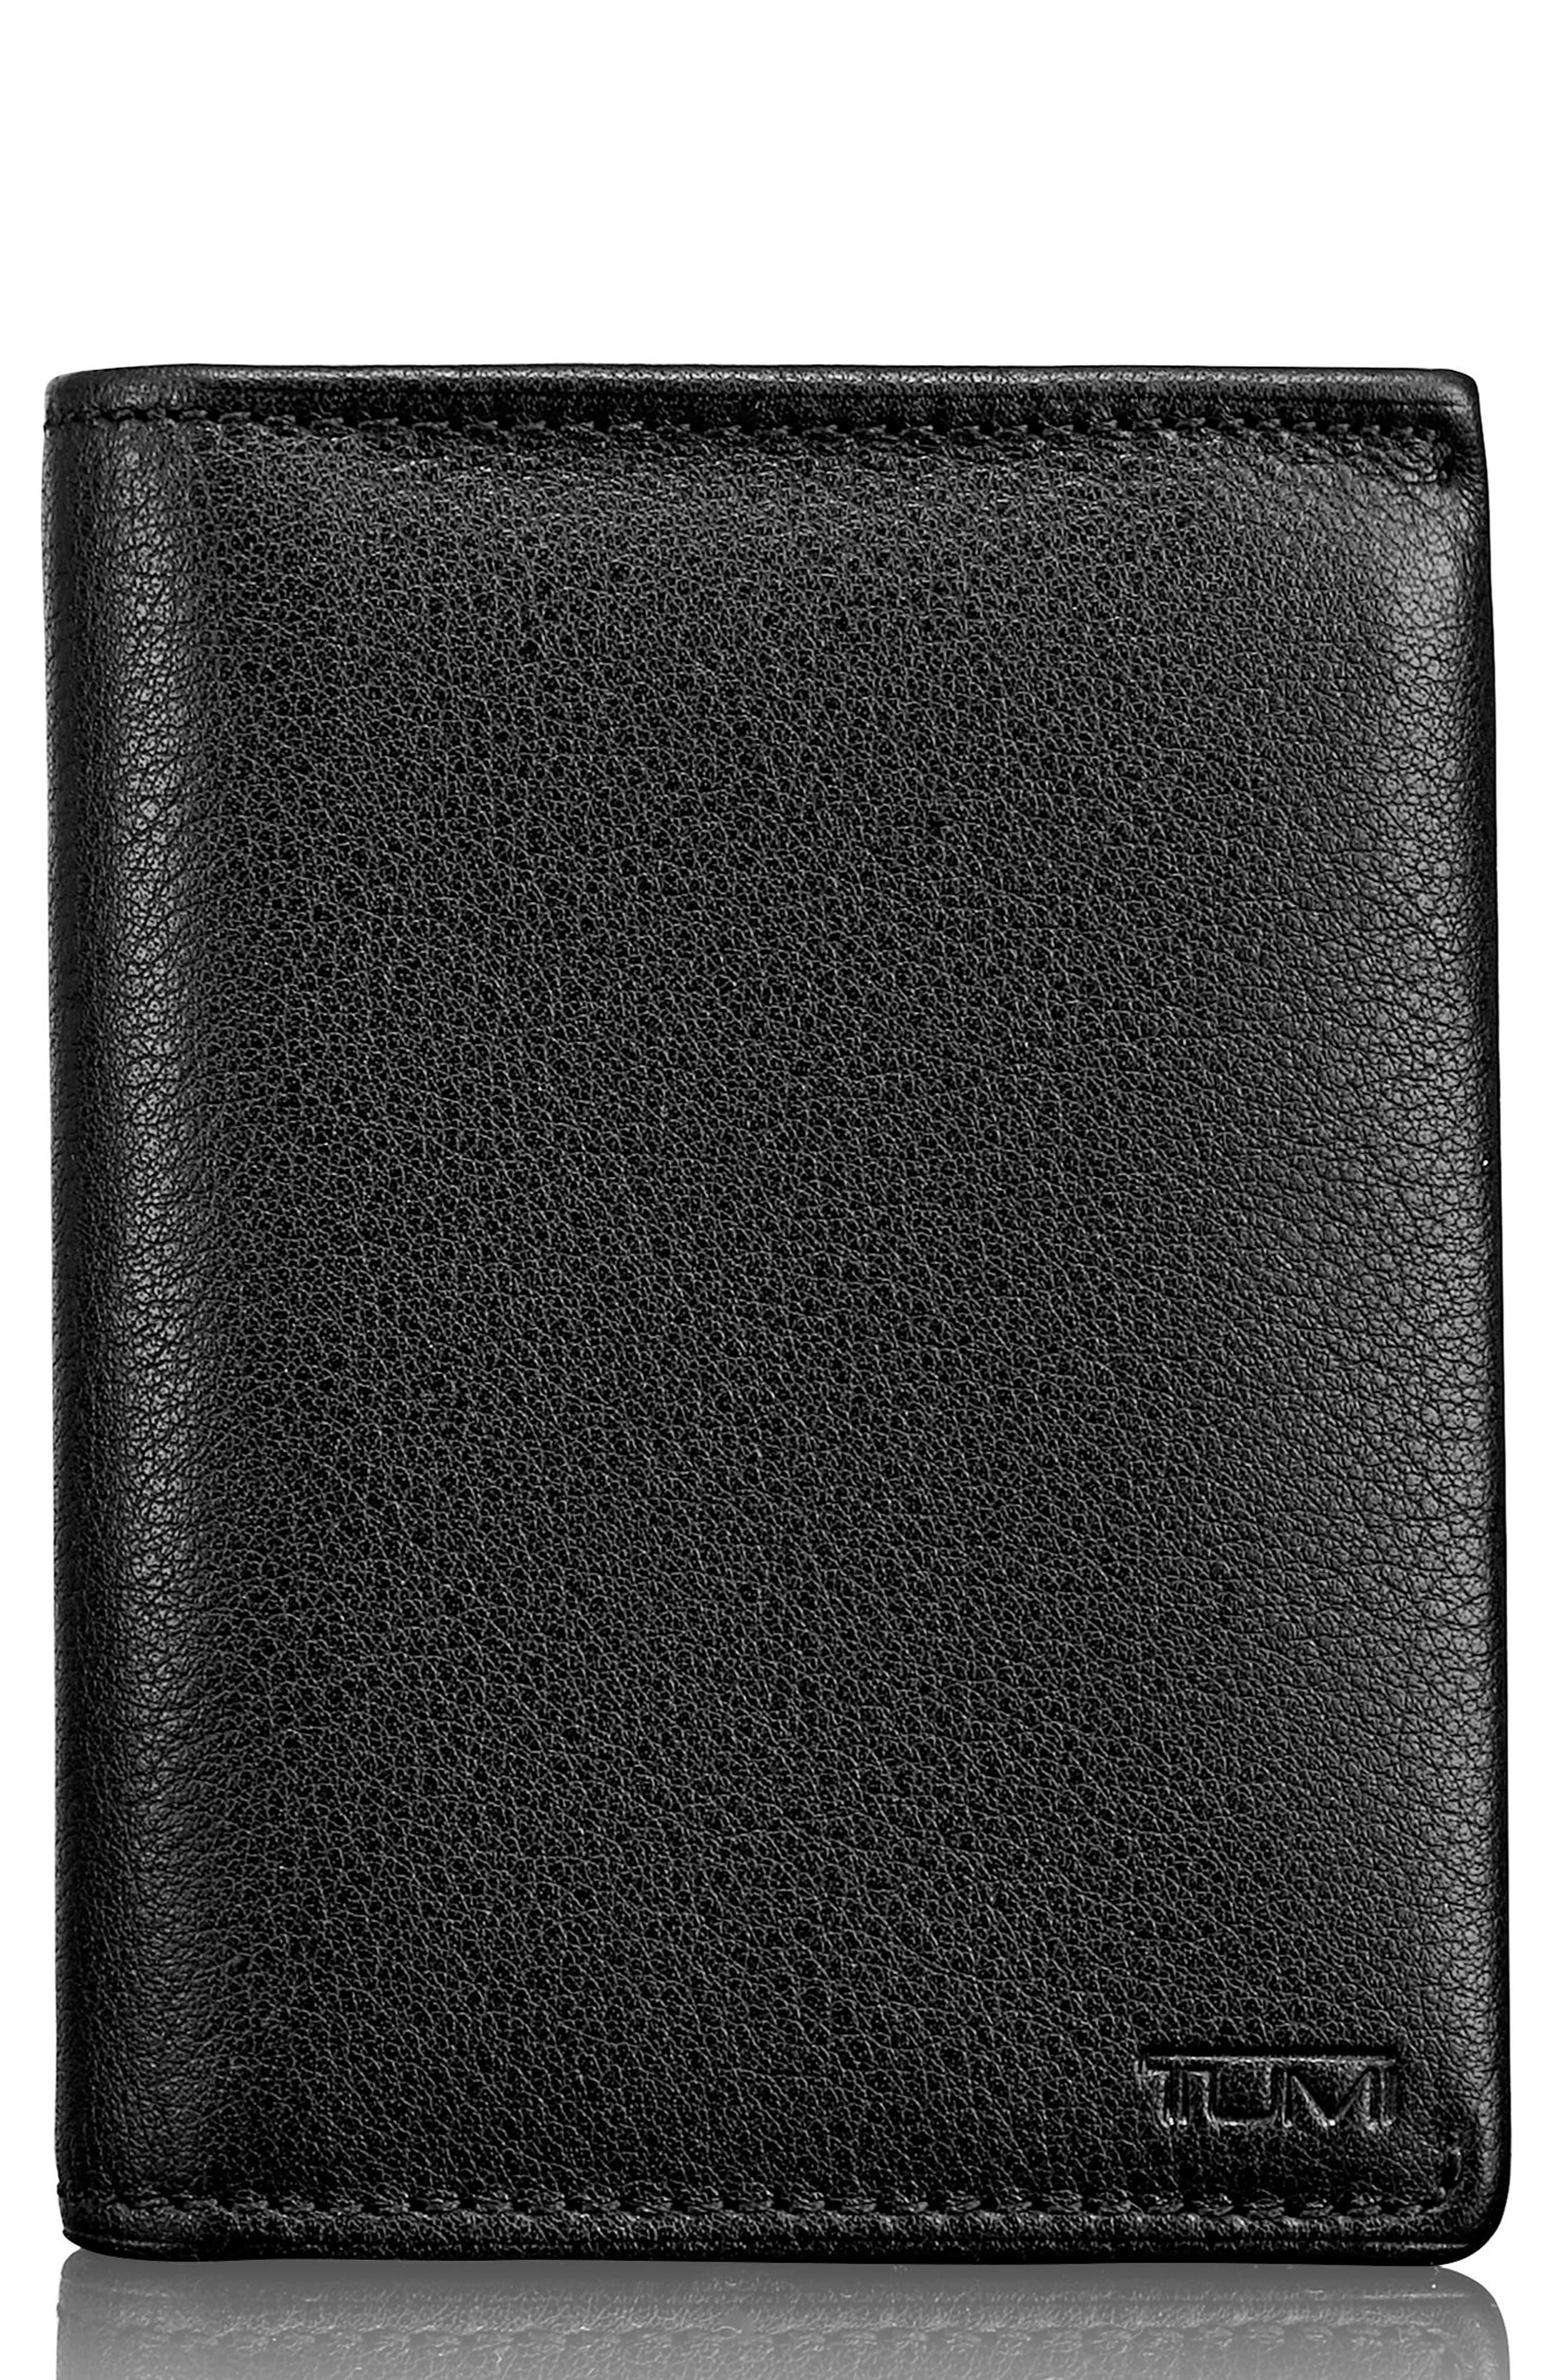 Main Image - Tumi Leather L-Fold Wallet